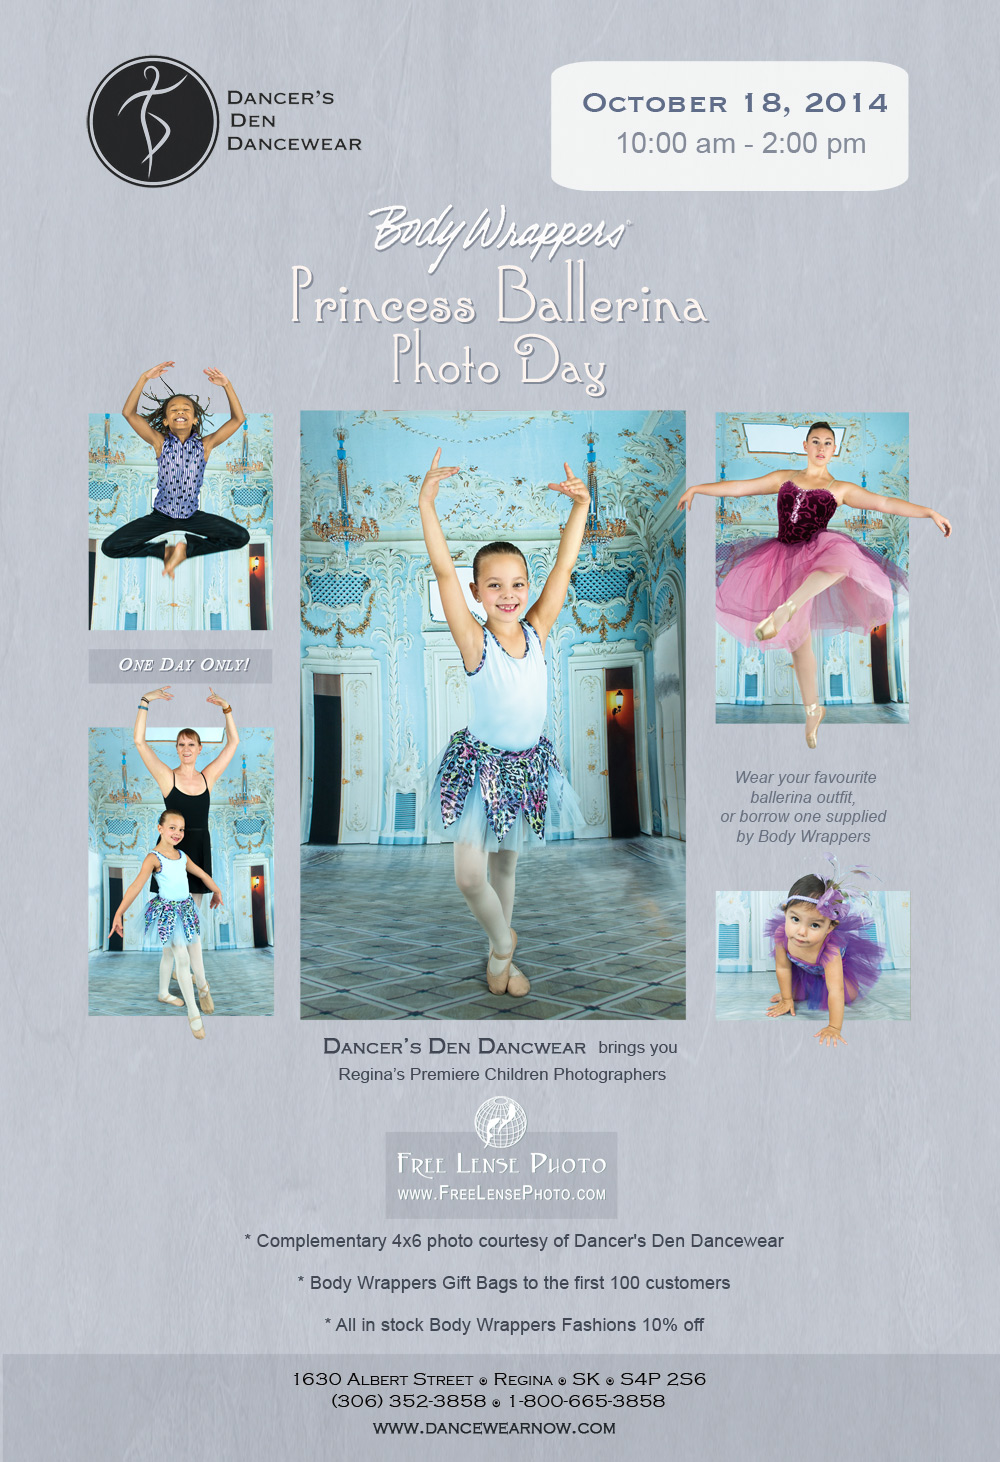 dancers-den-princess-ballerina-event.jpg